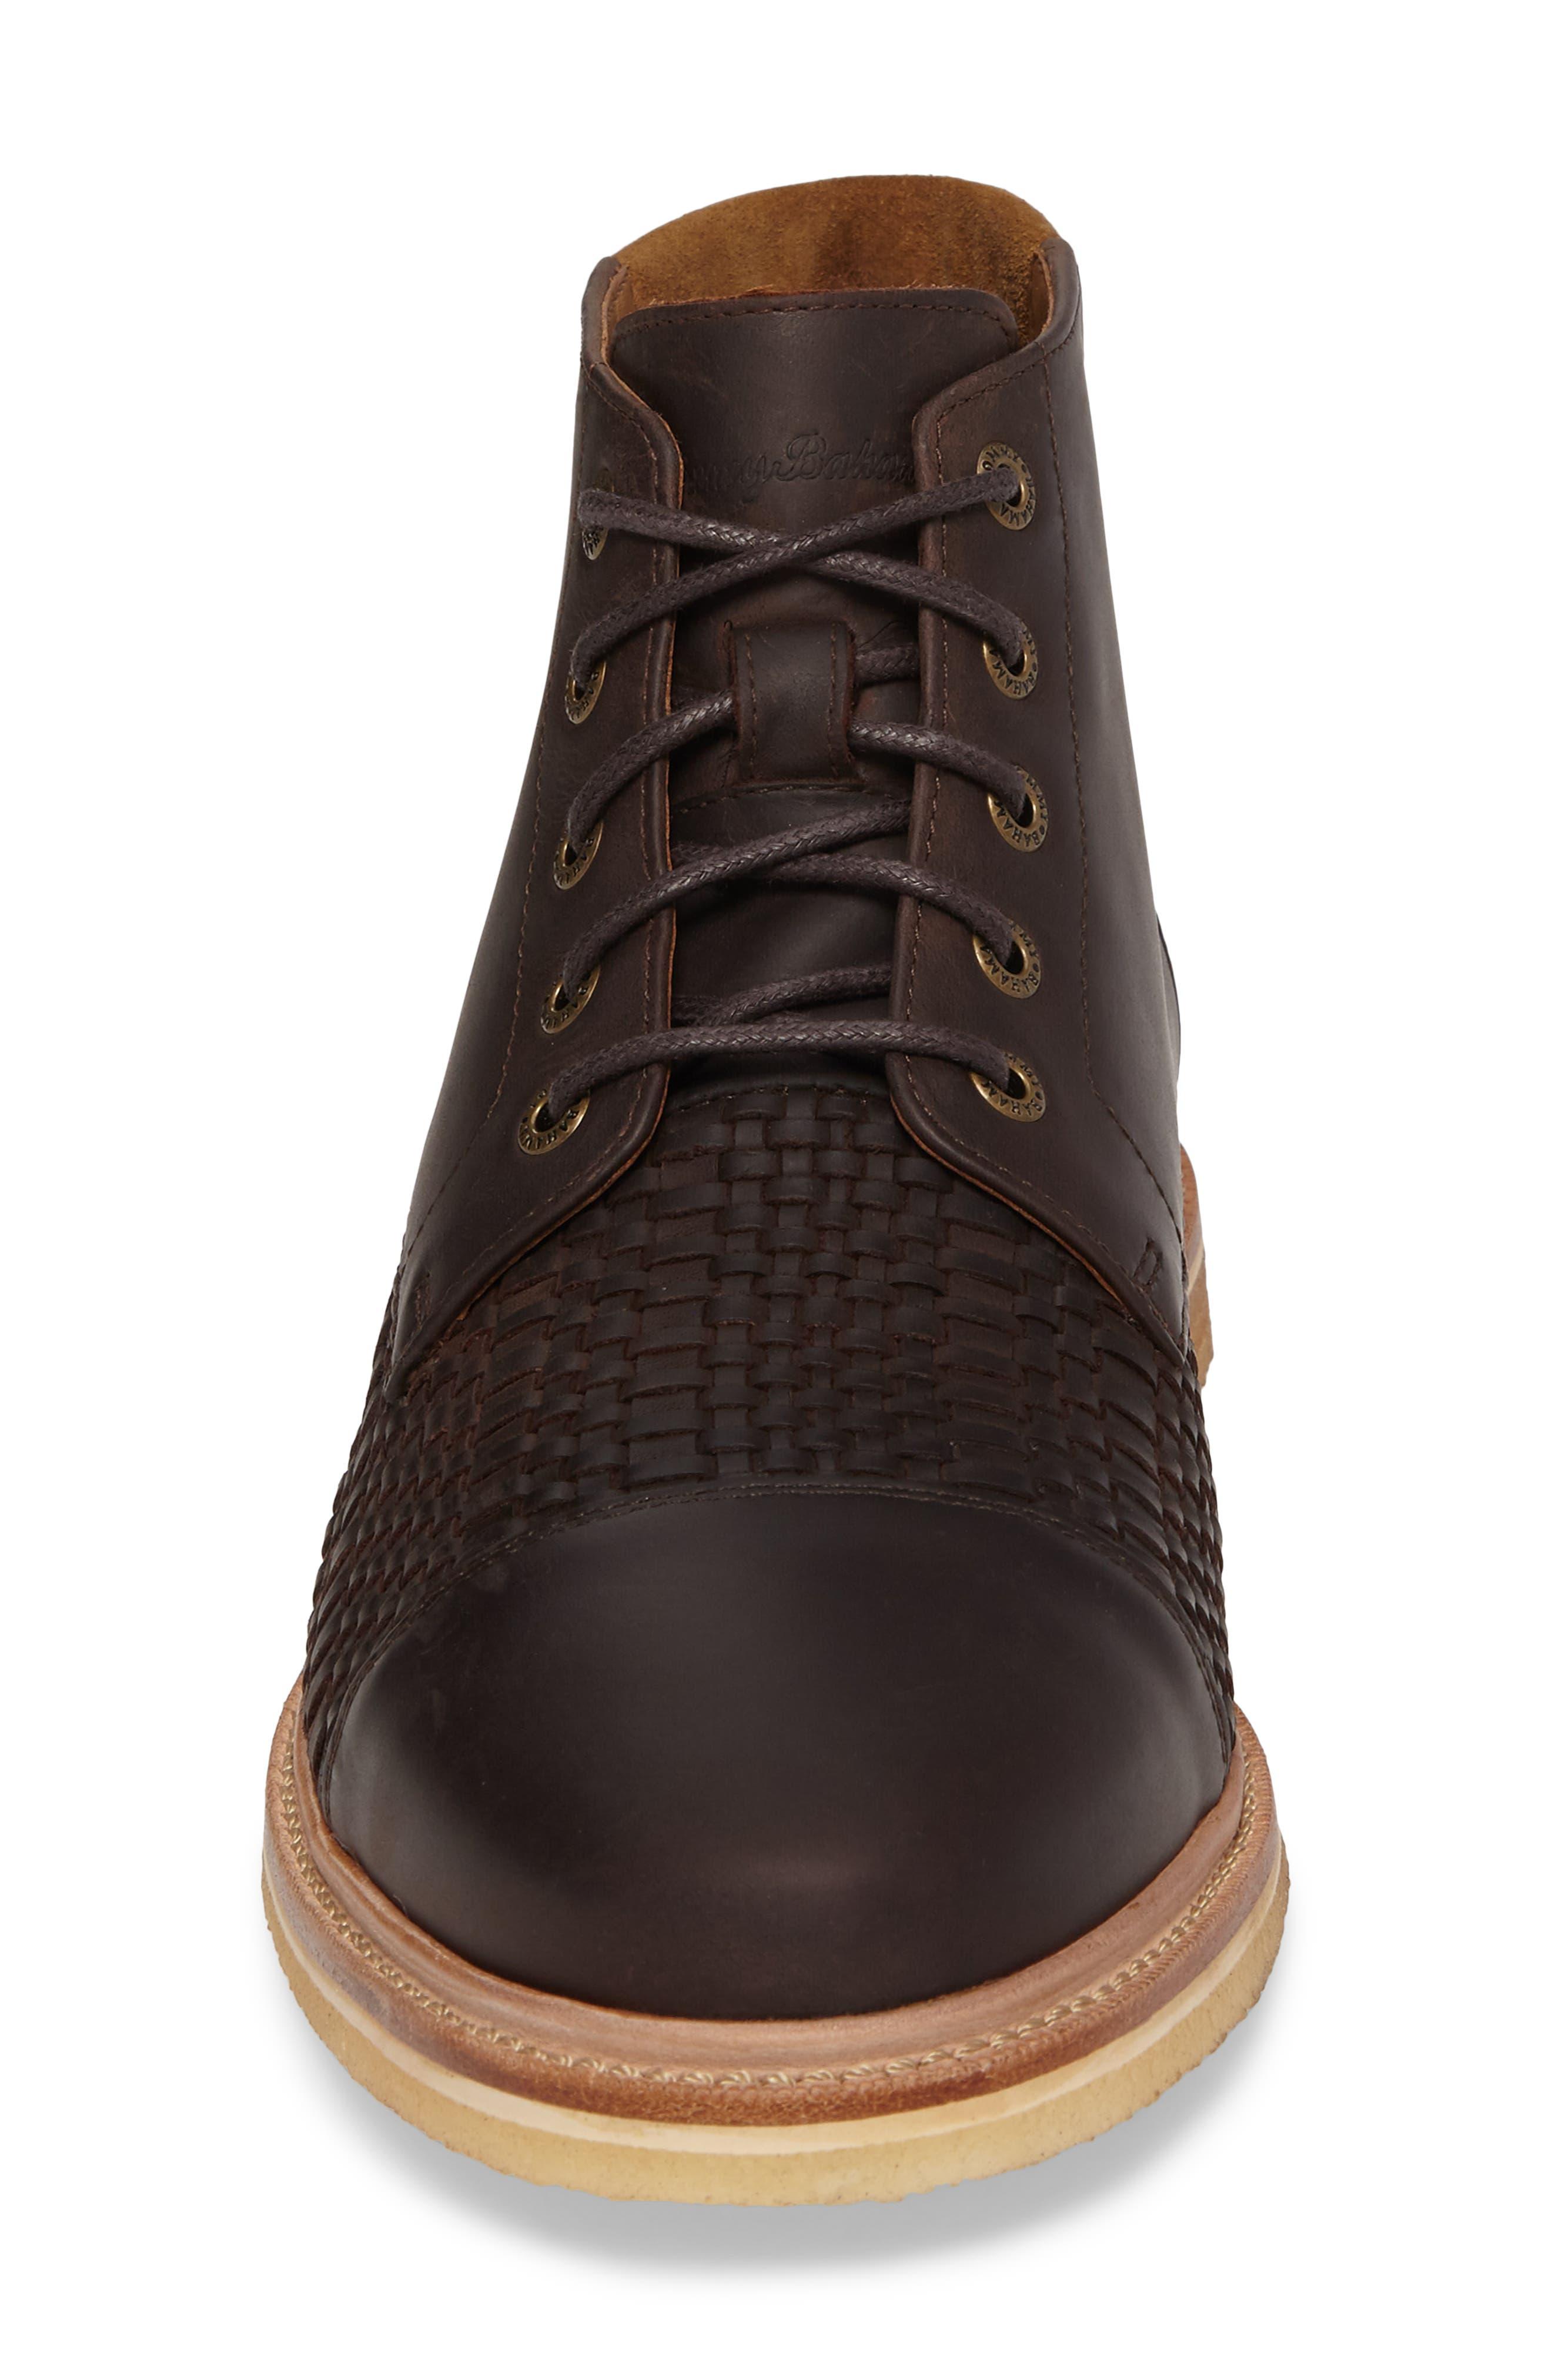 Argon Blooms Cap Toe Boot,                             Alternate thumbnail 4, color,                             Brown Leather